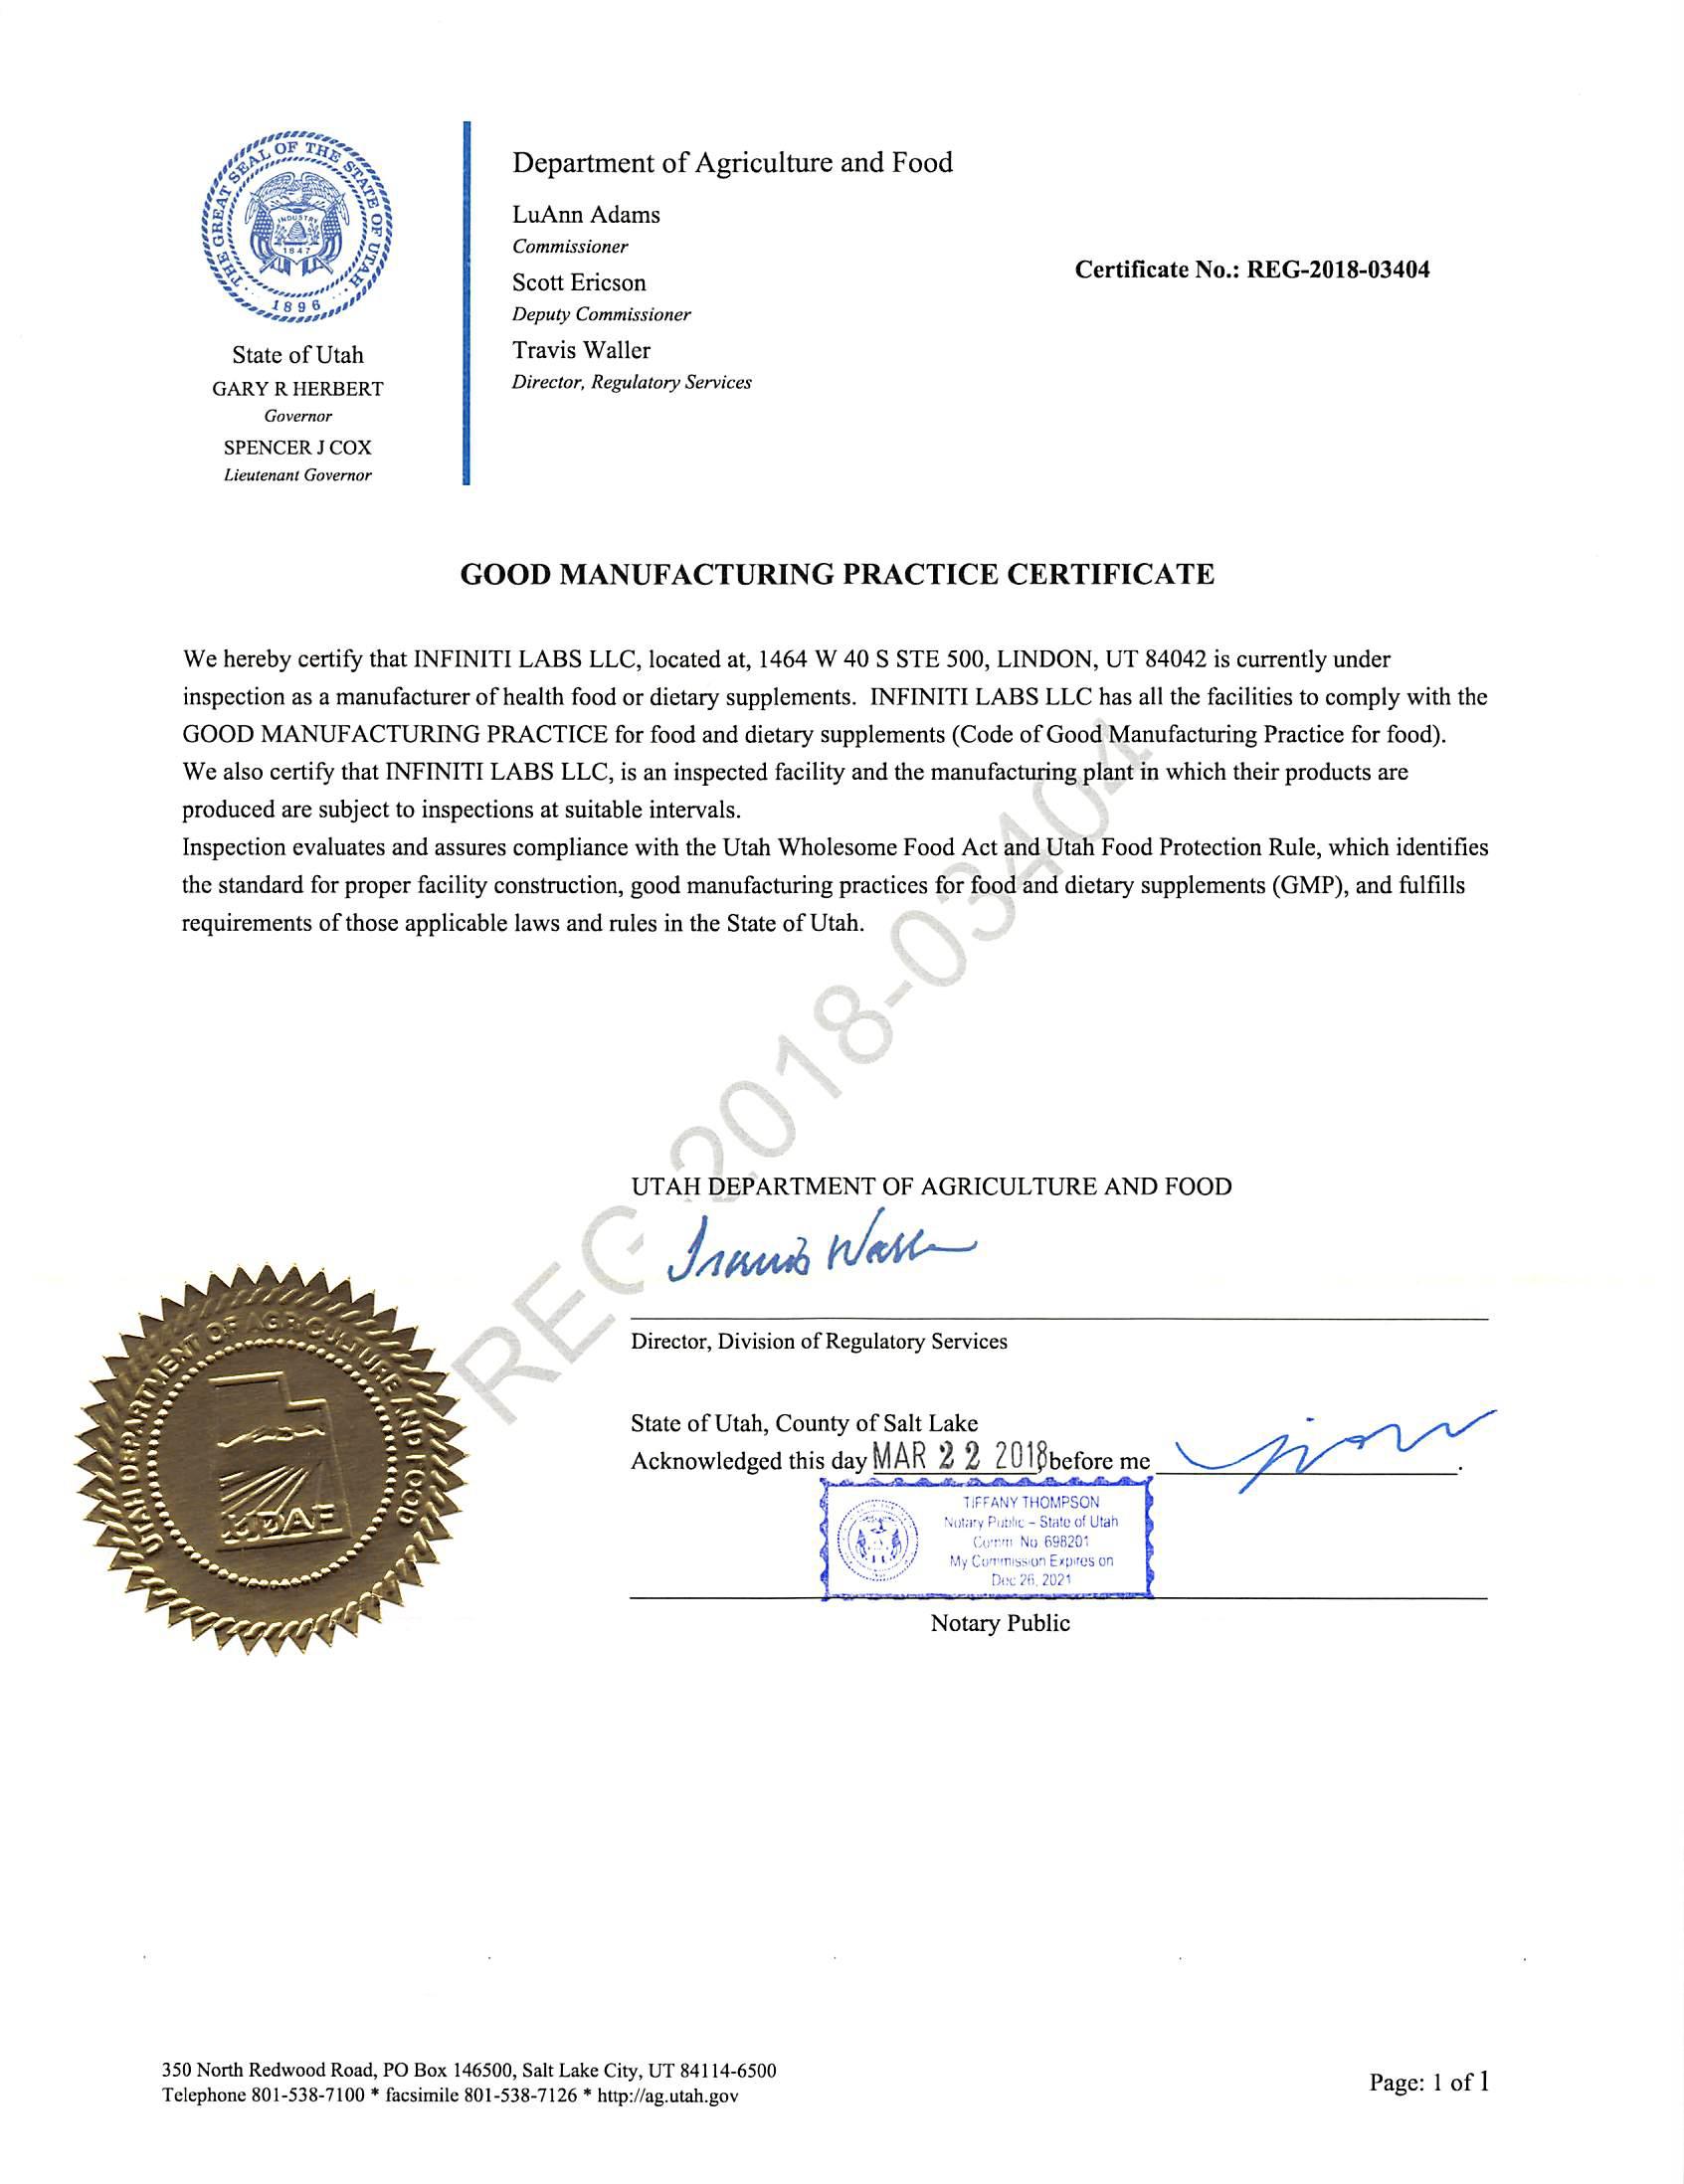 infiniti-labs-gmp-certificate.jpg